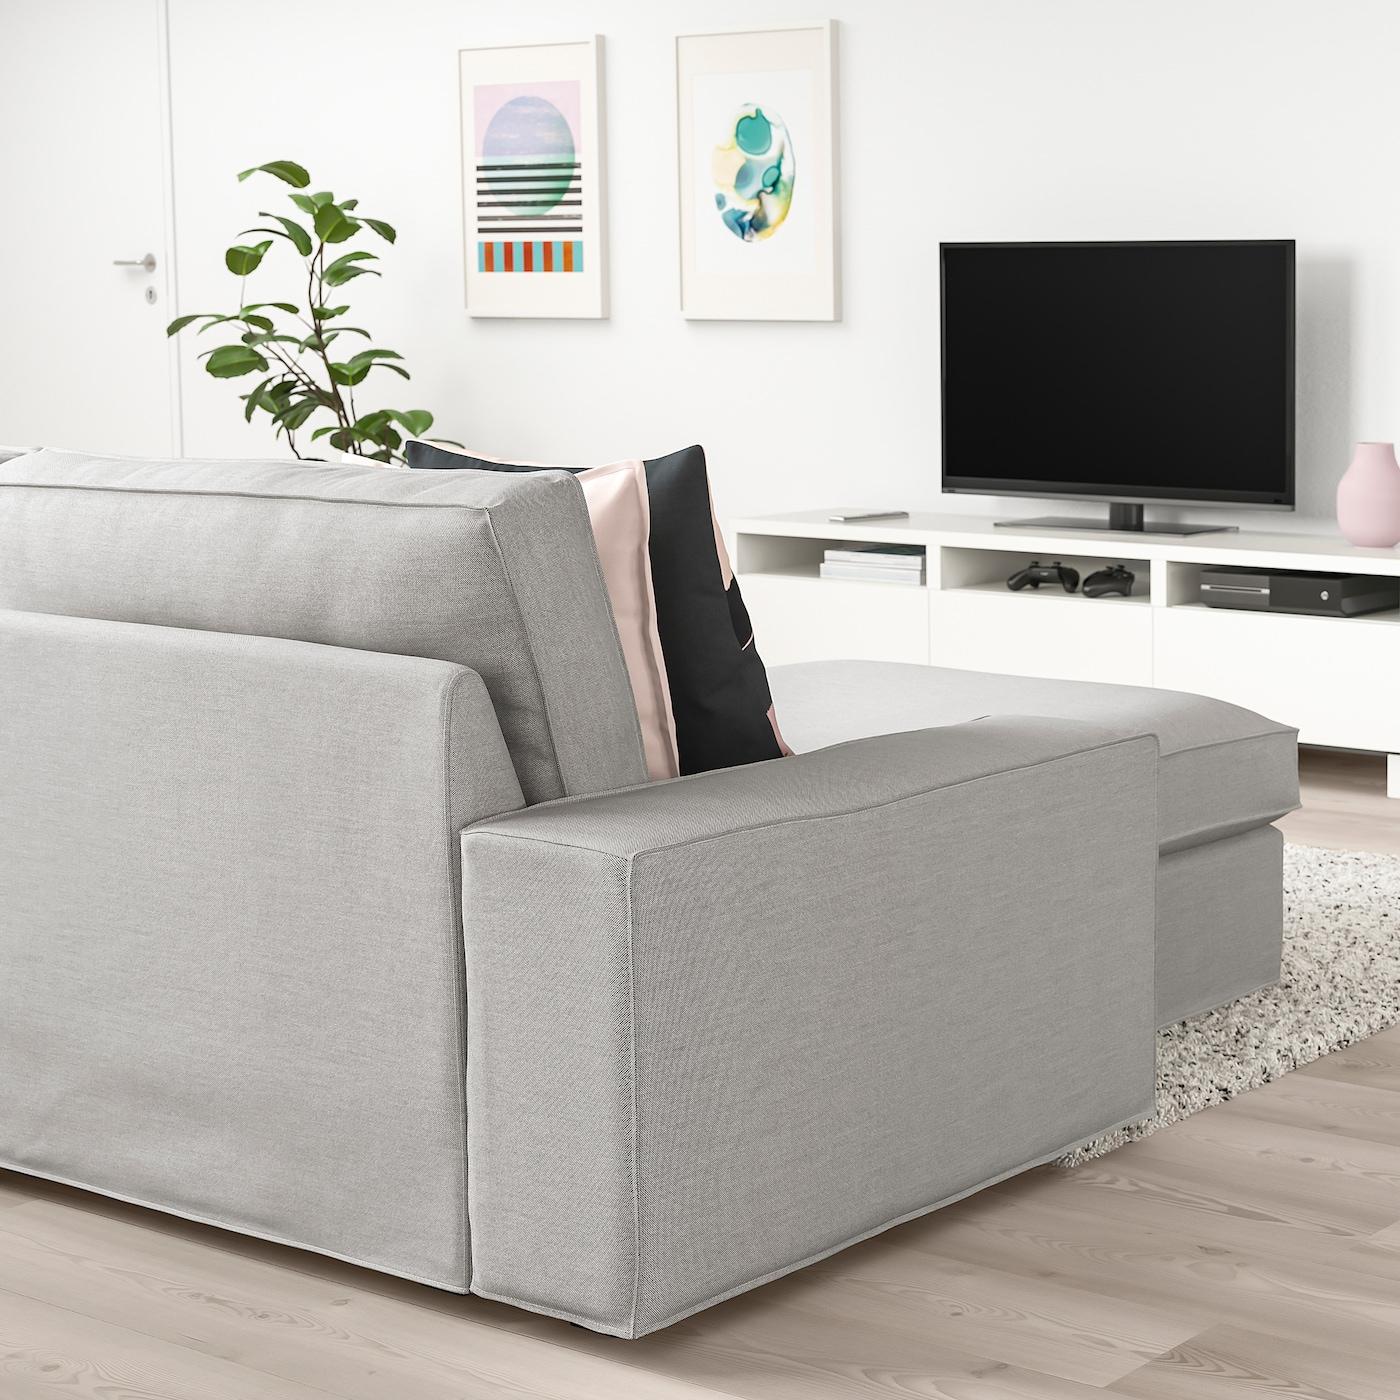 KIVIK Sofá 4 plazas +chaiselongueOrrsta gris claro